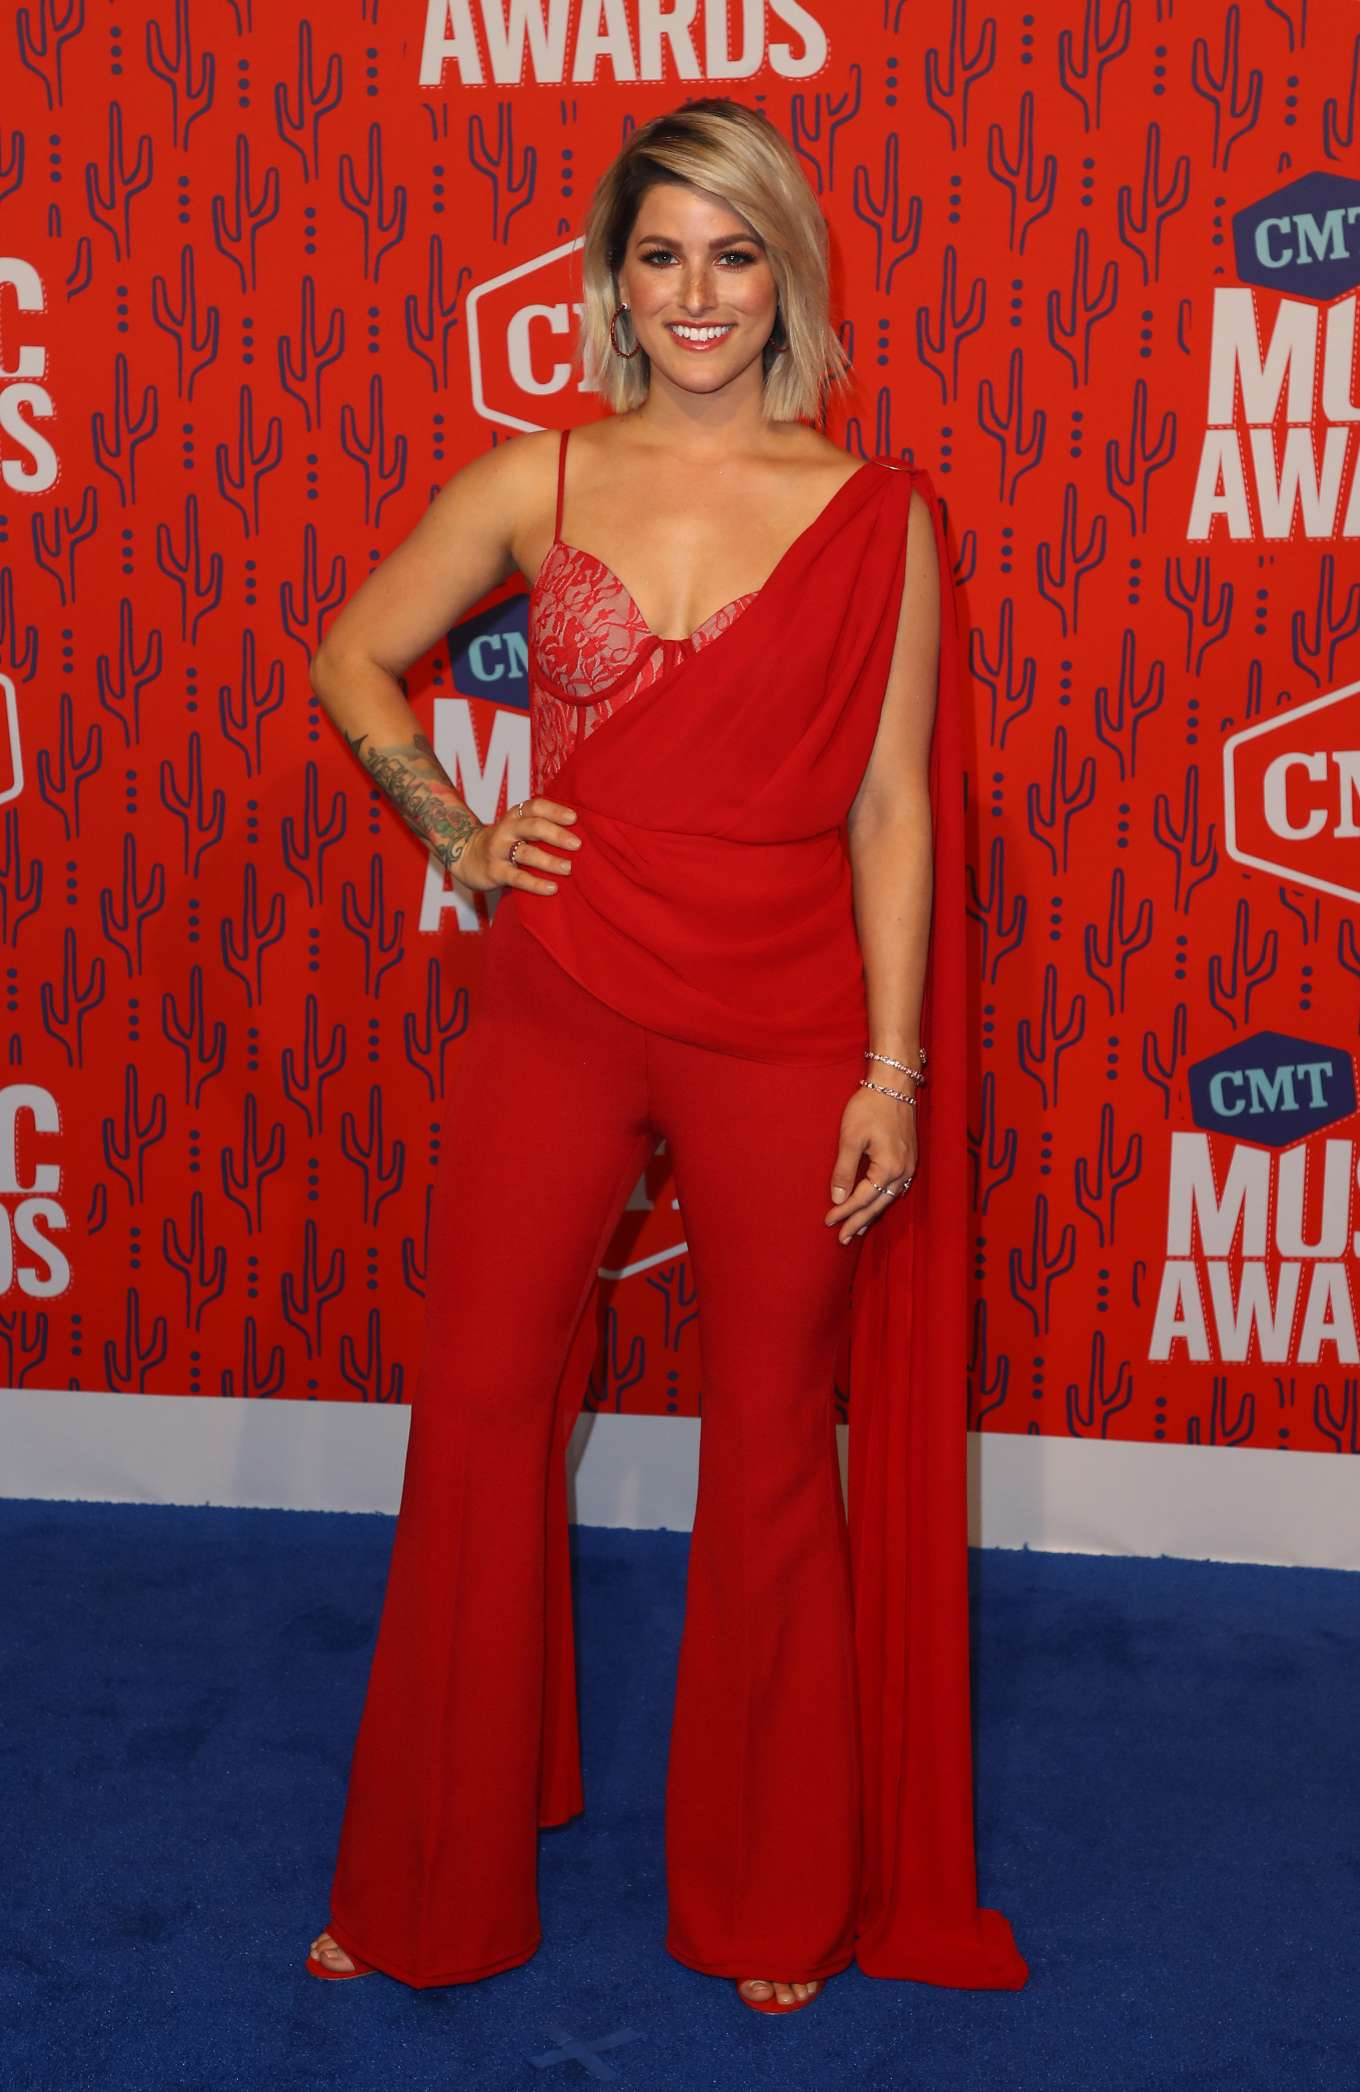 Cassadee Pope 2019 : Cassadee Pope: 2019 CMT Music Awards-06